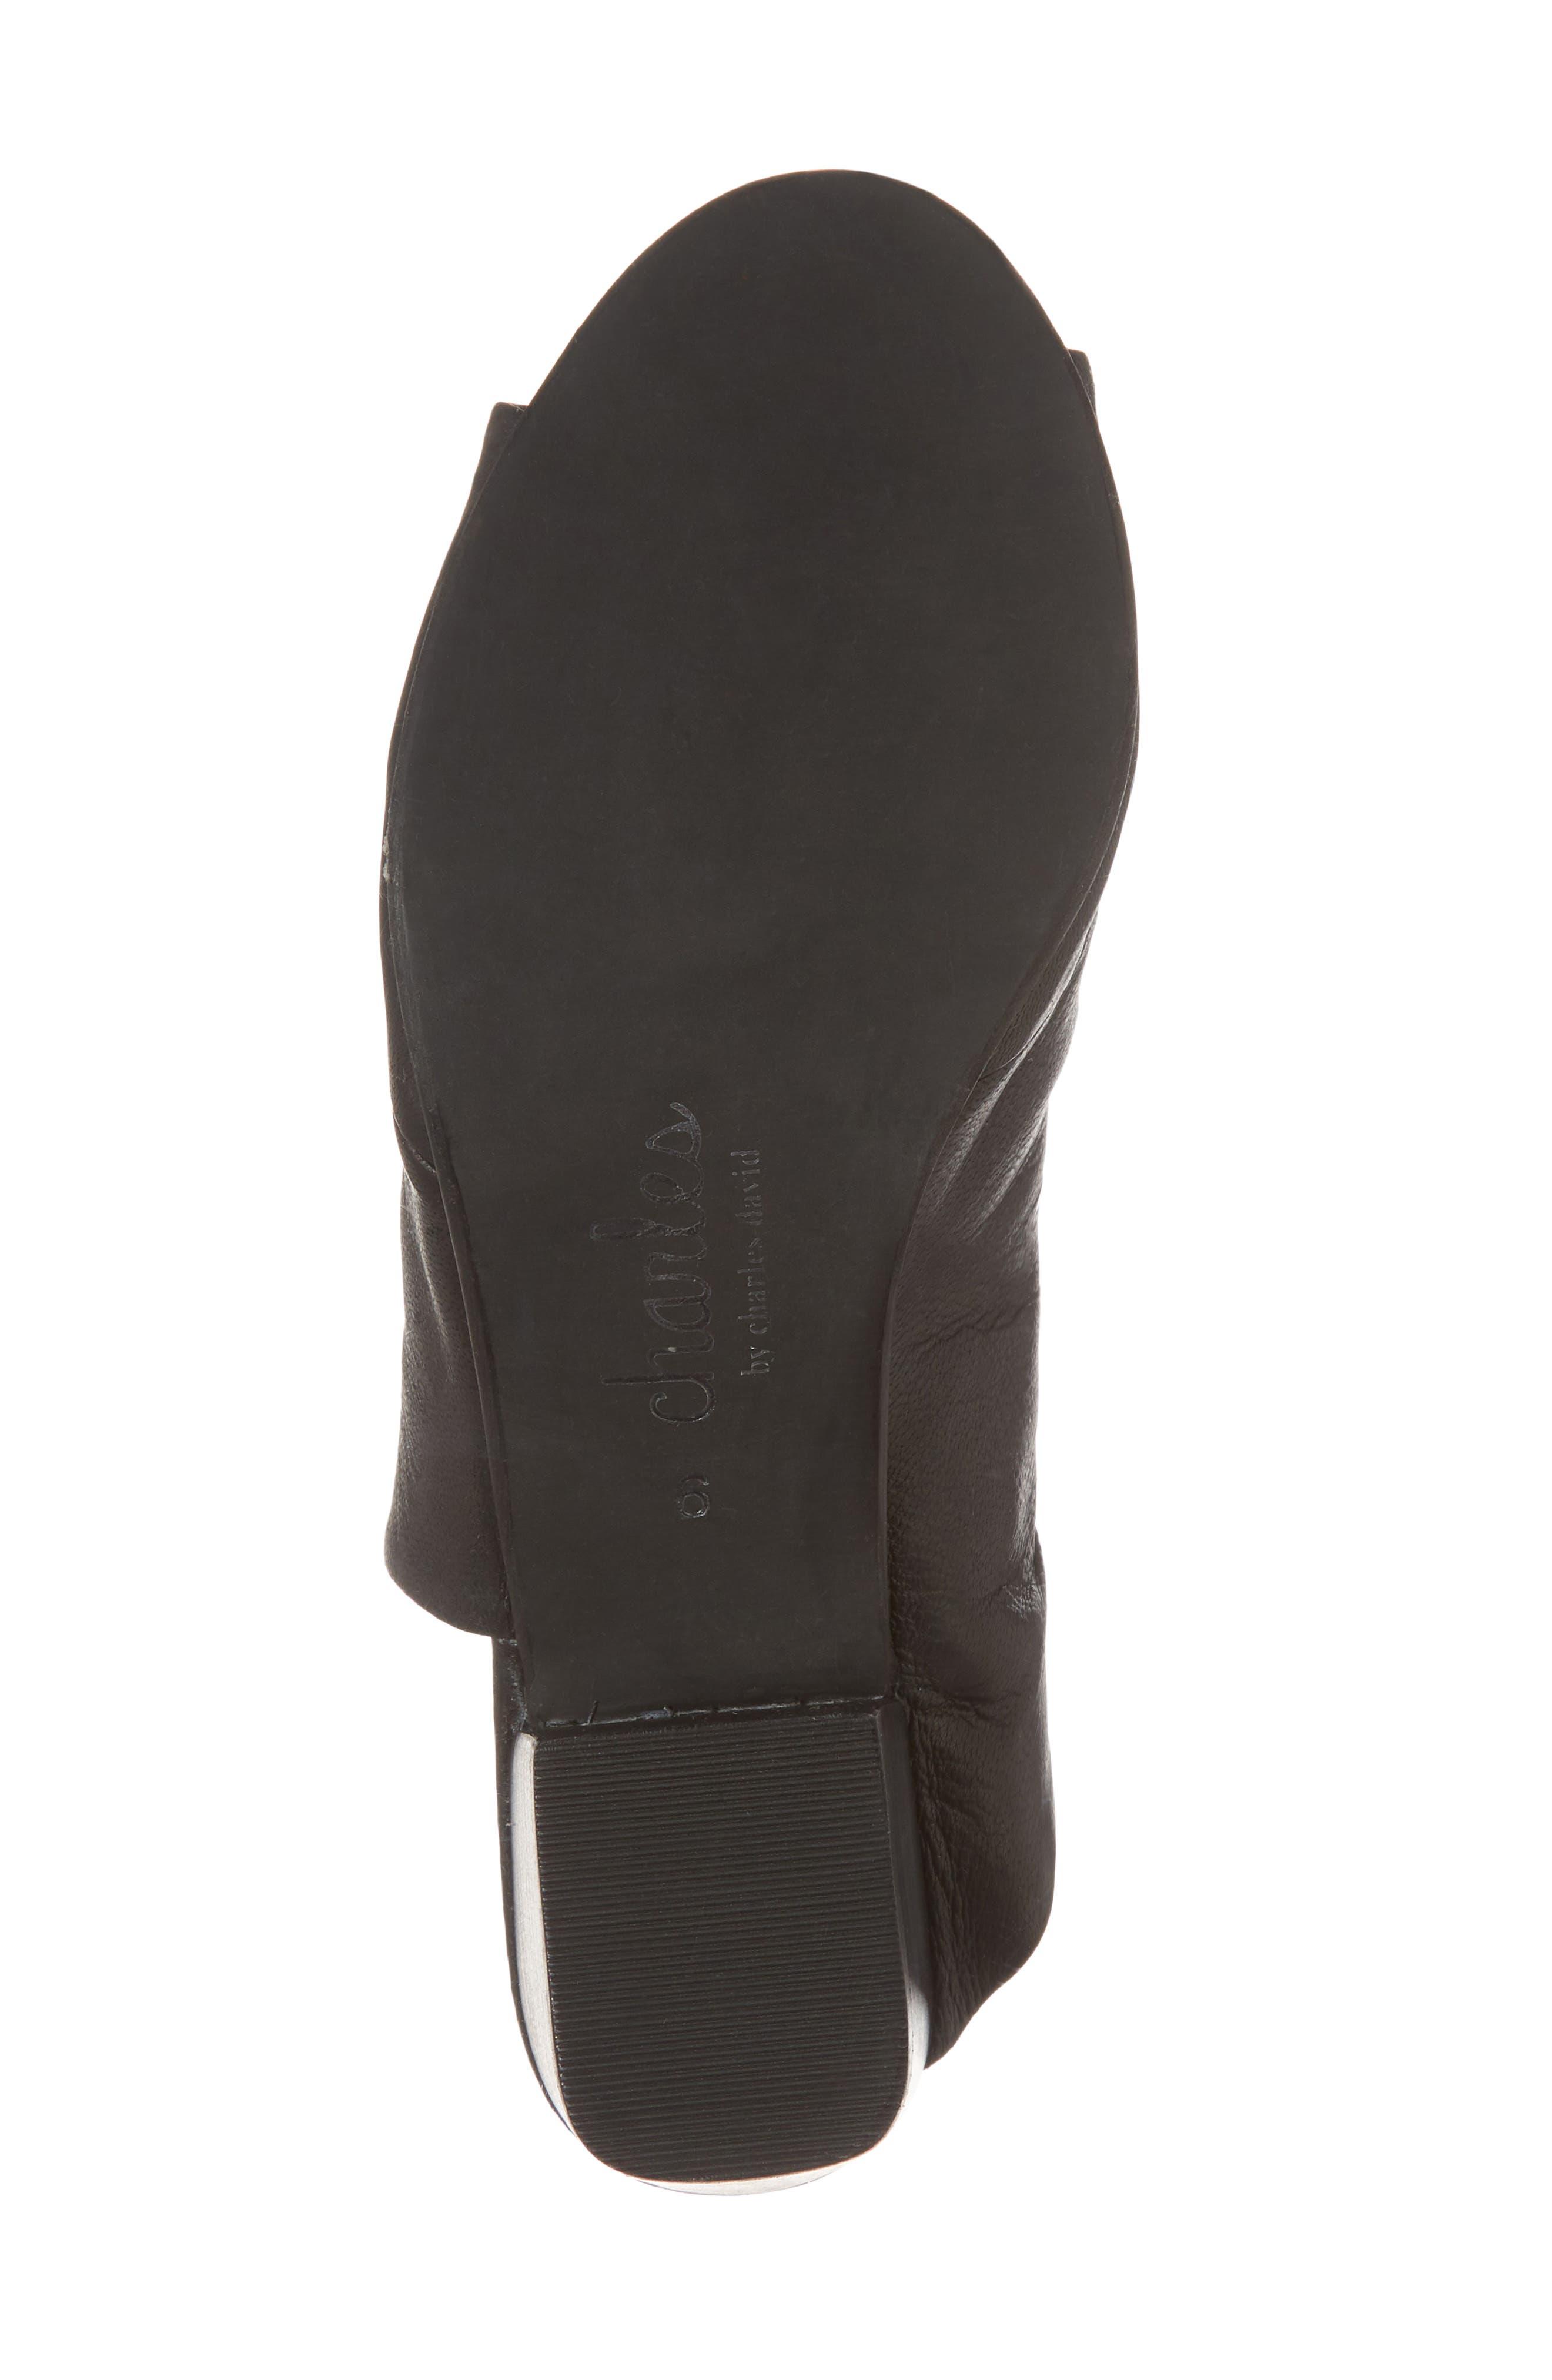 Yanna Block Heel Slide Sandal,                             Alternate thumbnail 6, color,                             BLACK LEATHER